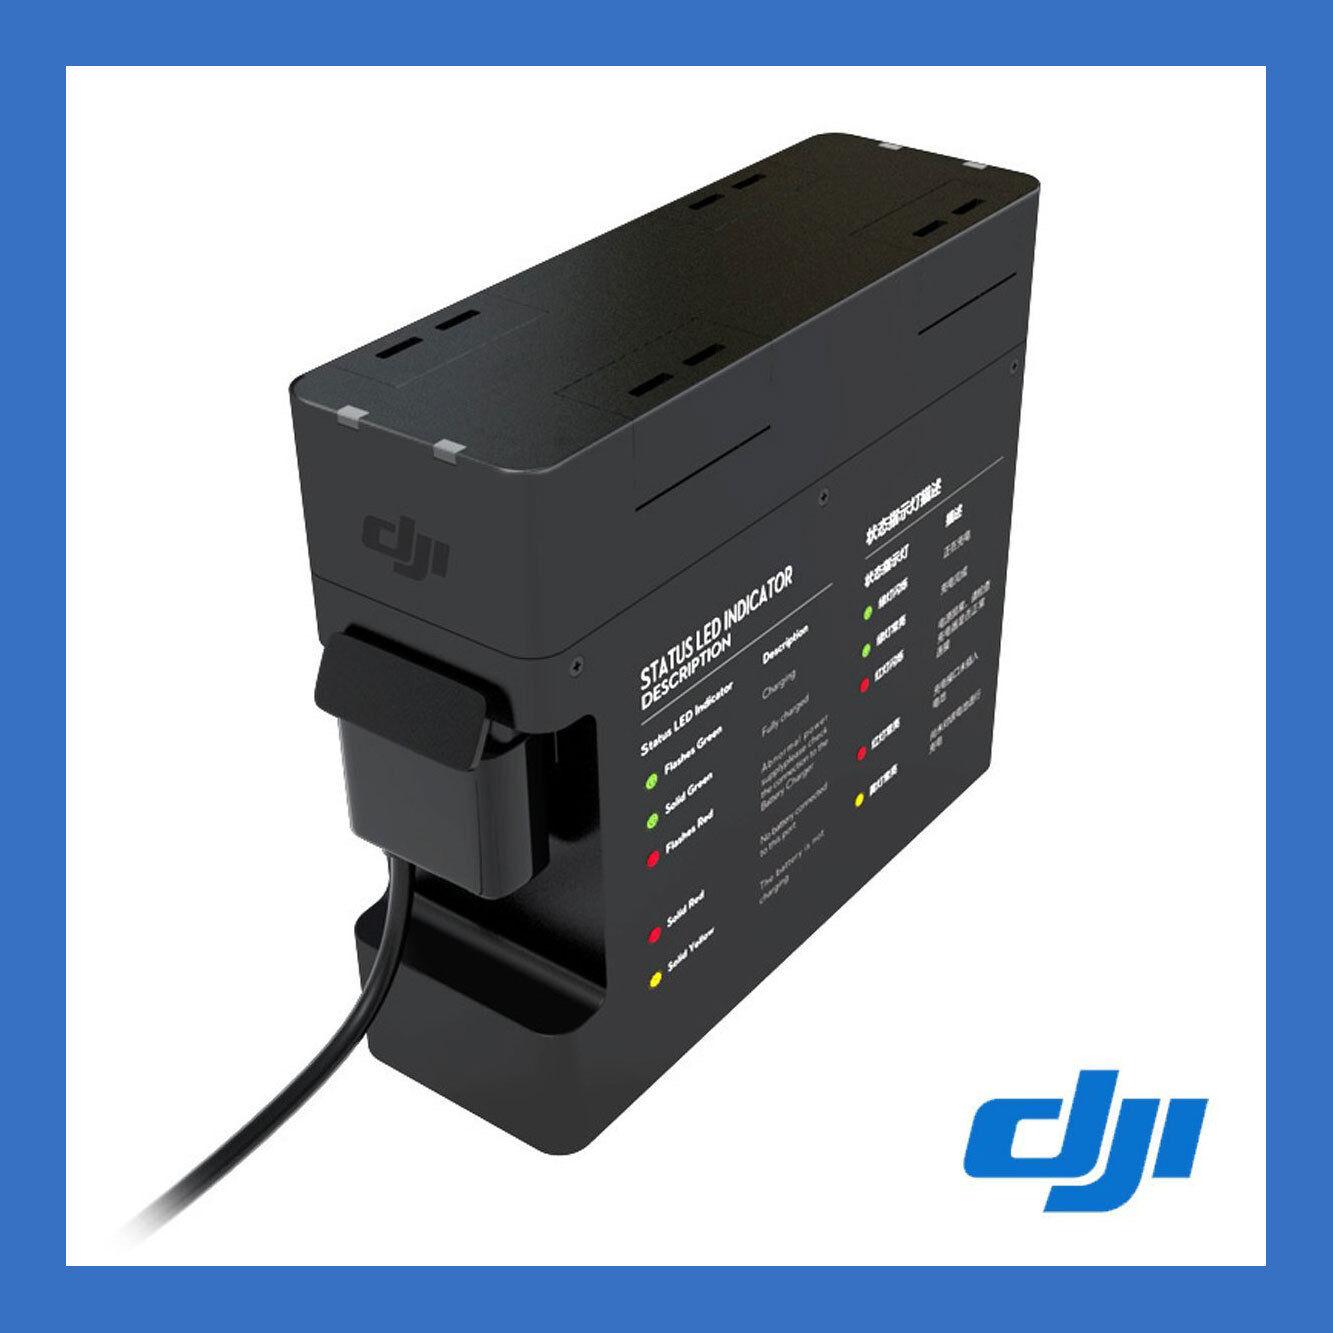 DJI Inspire 1 Part 55 Battery Charging Hub - US dealer